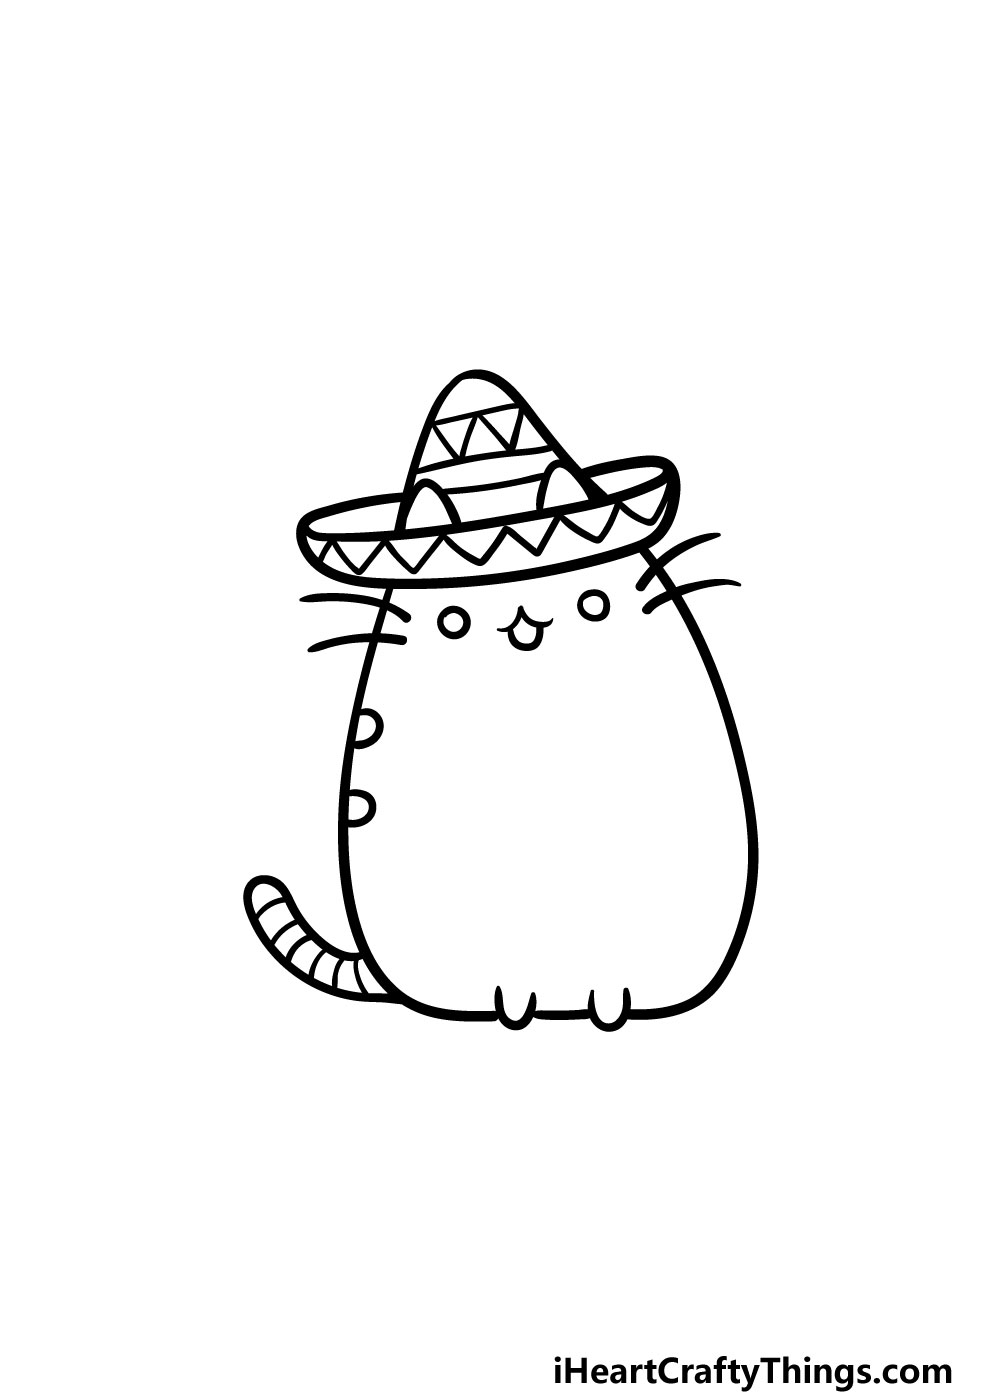 drawing pusheen cat step 5